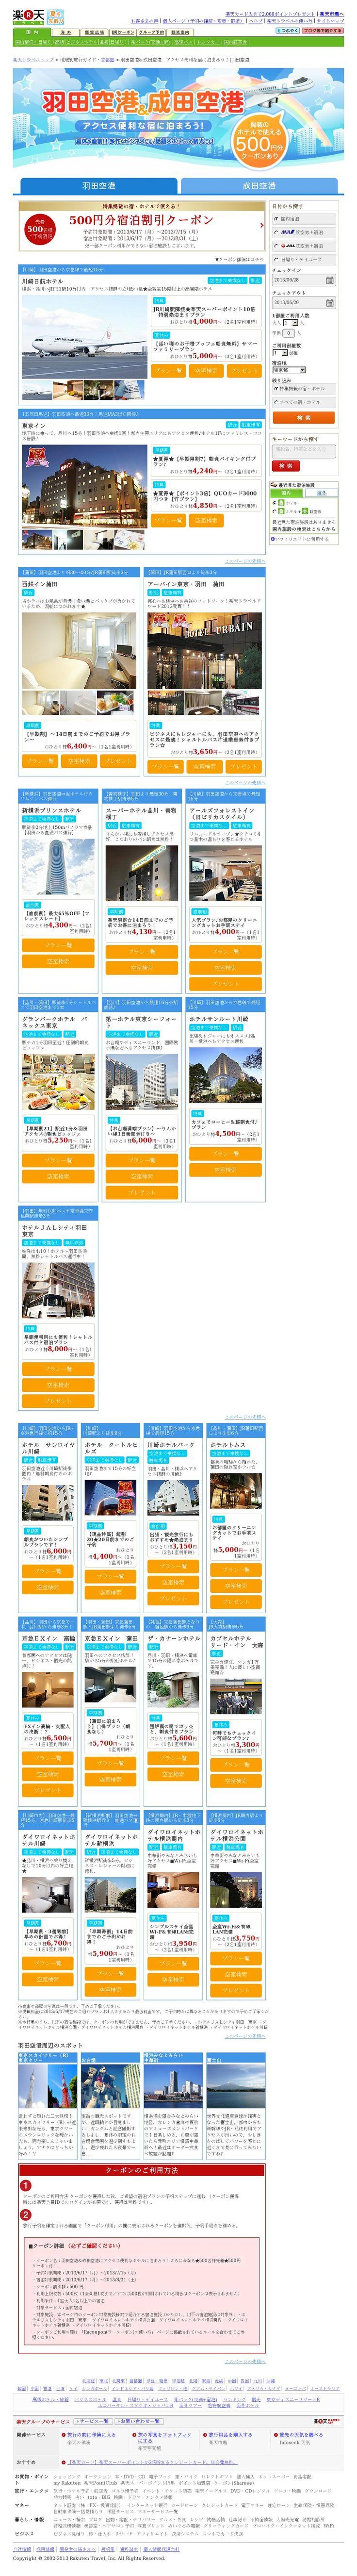 【D/C】【エリア特集】羽田・成田空港へアクセス便利なホテル特集<2013/06/17>